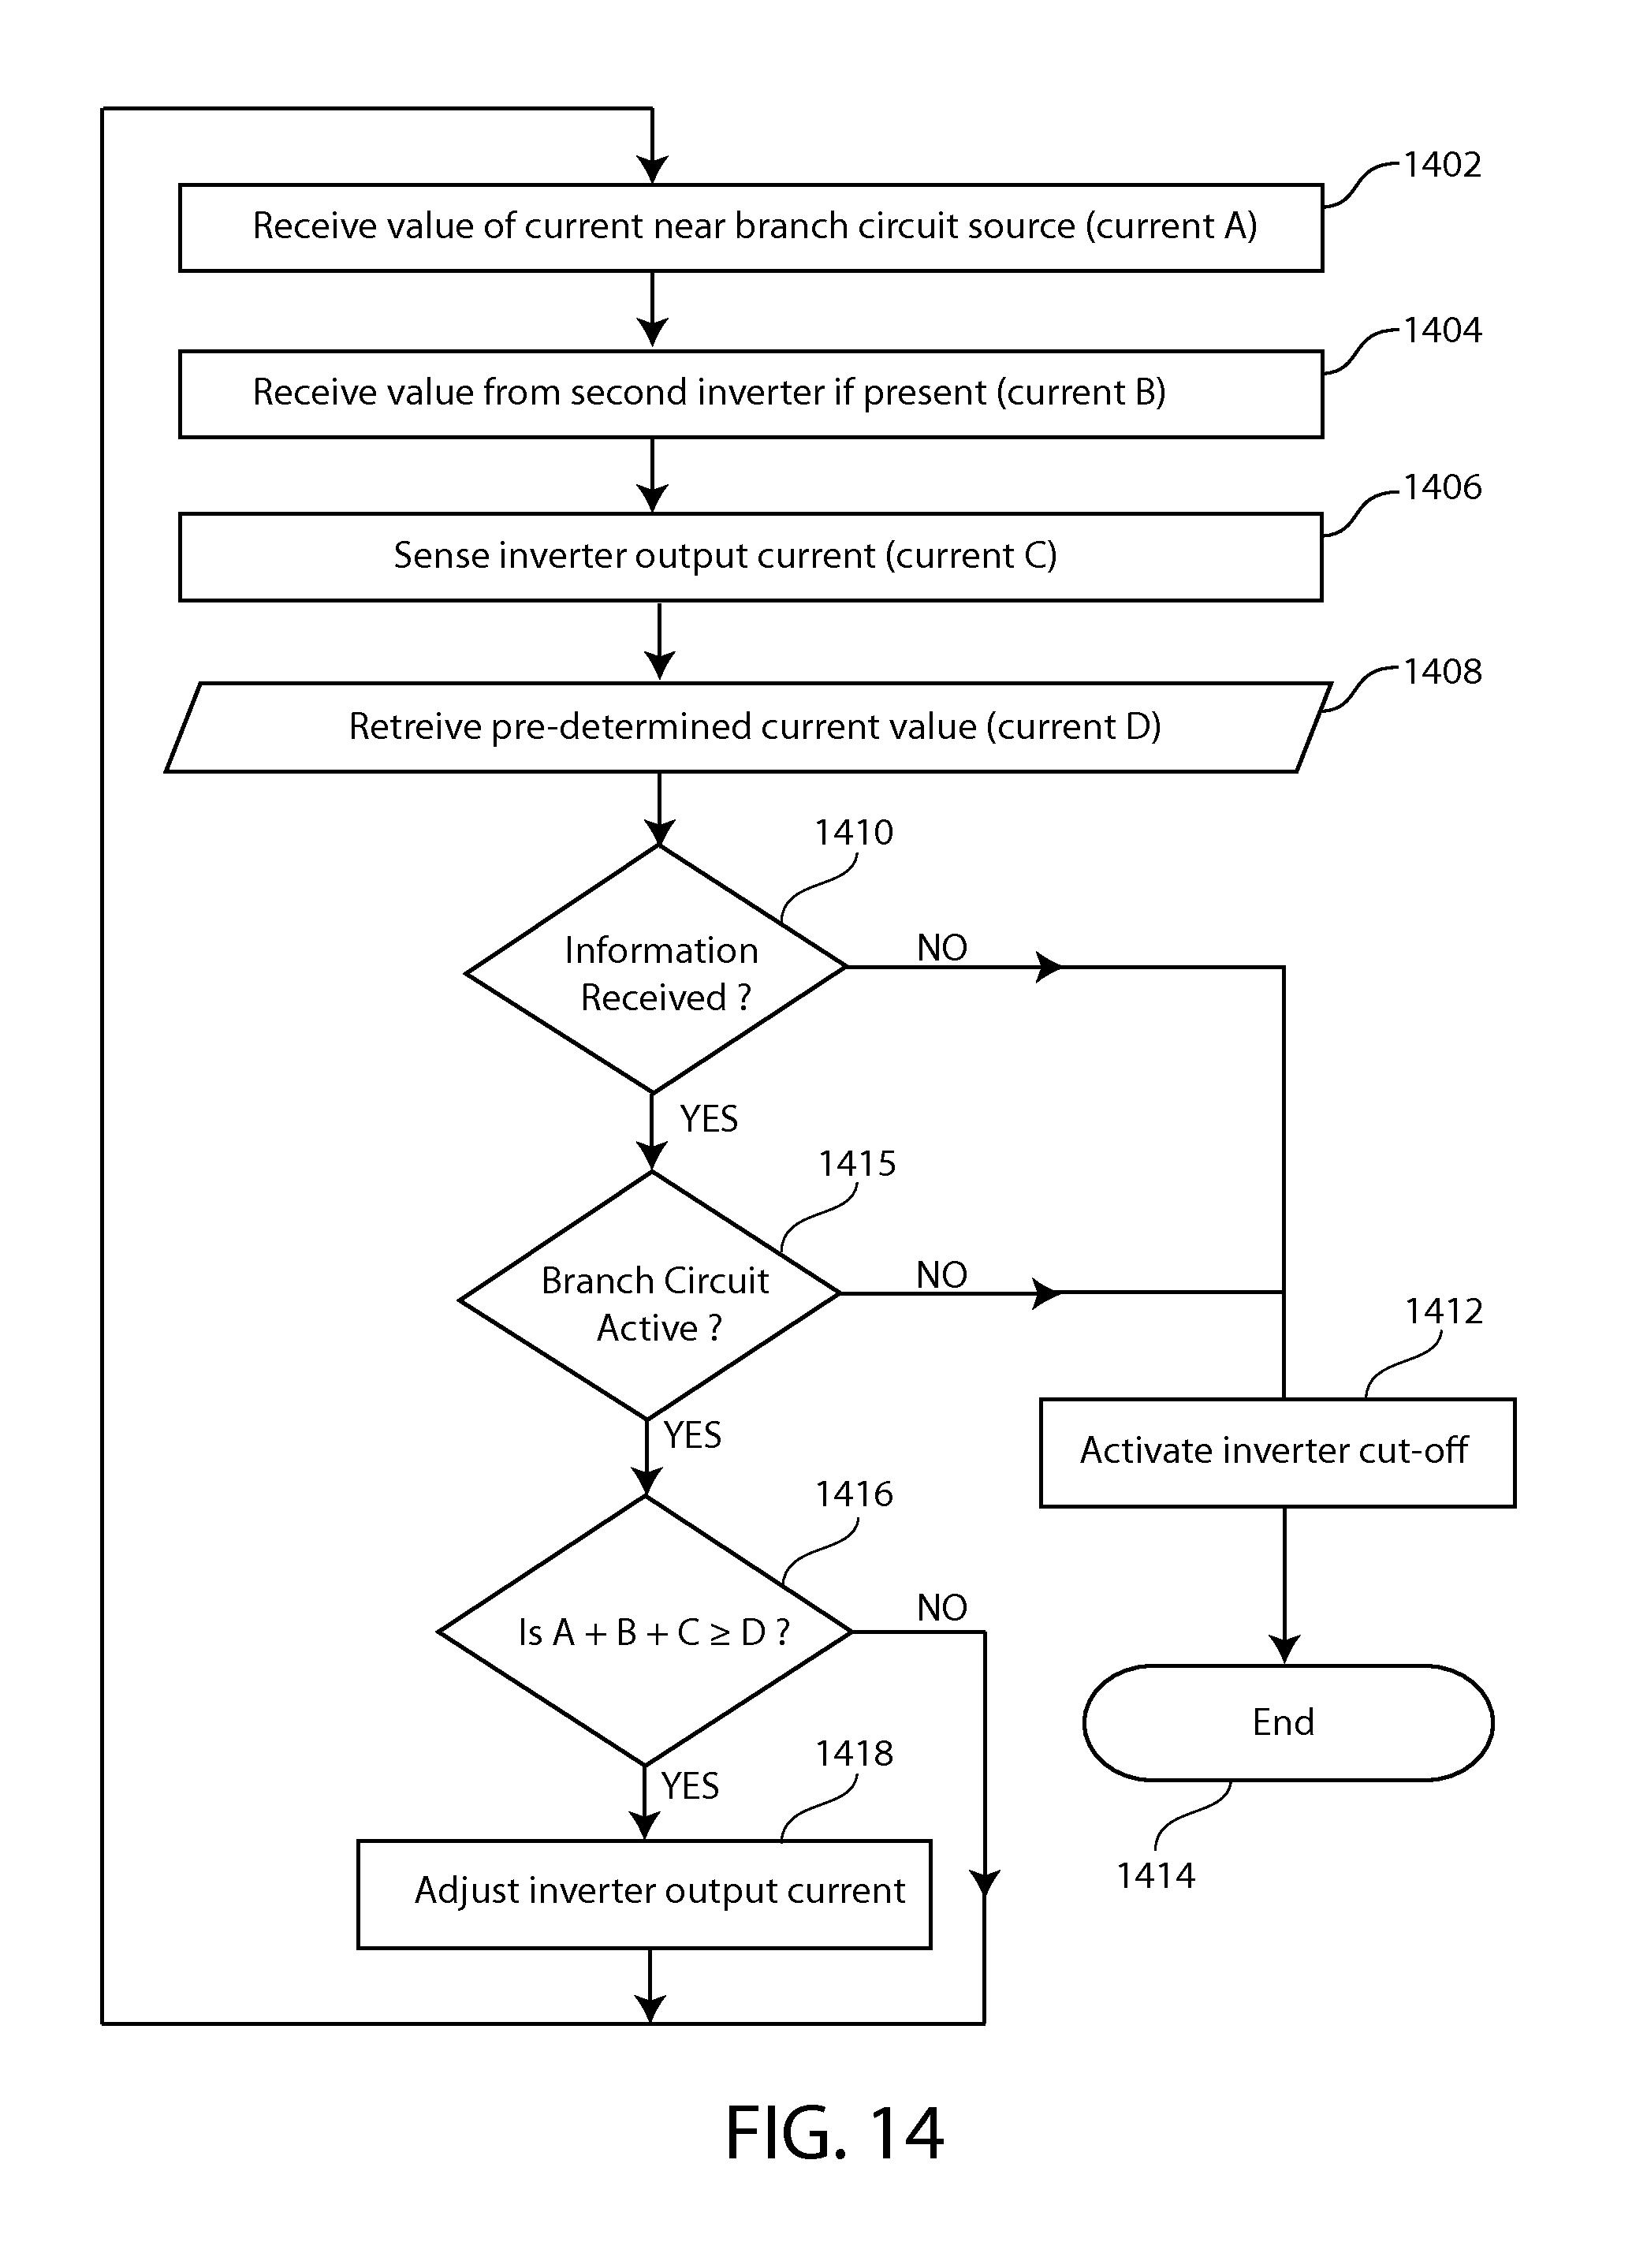 Patent US 8,362,646 B2